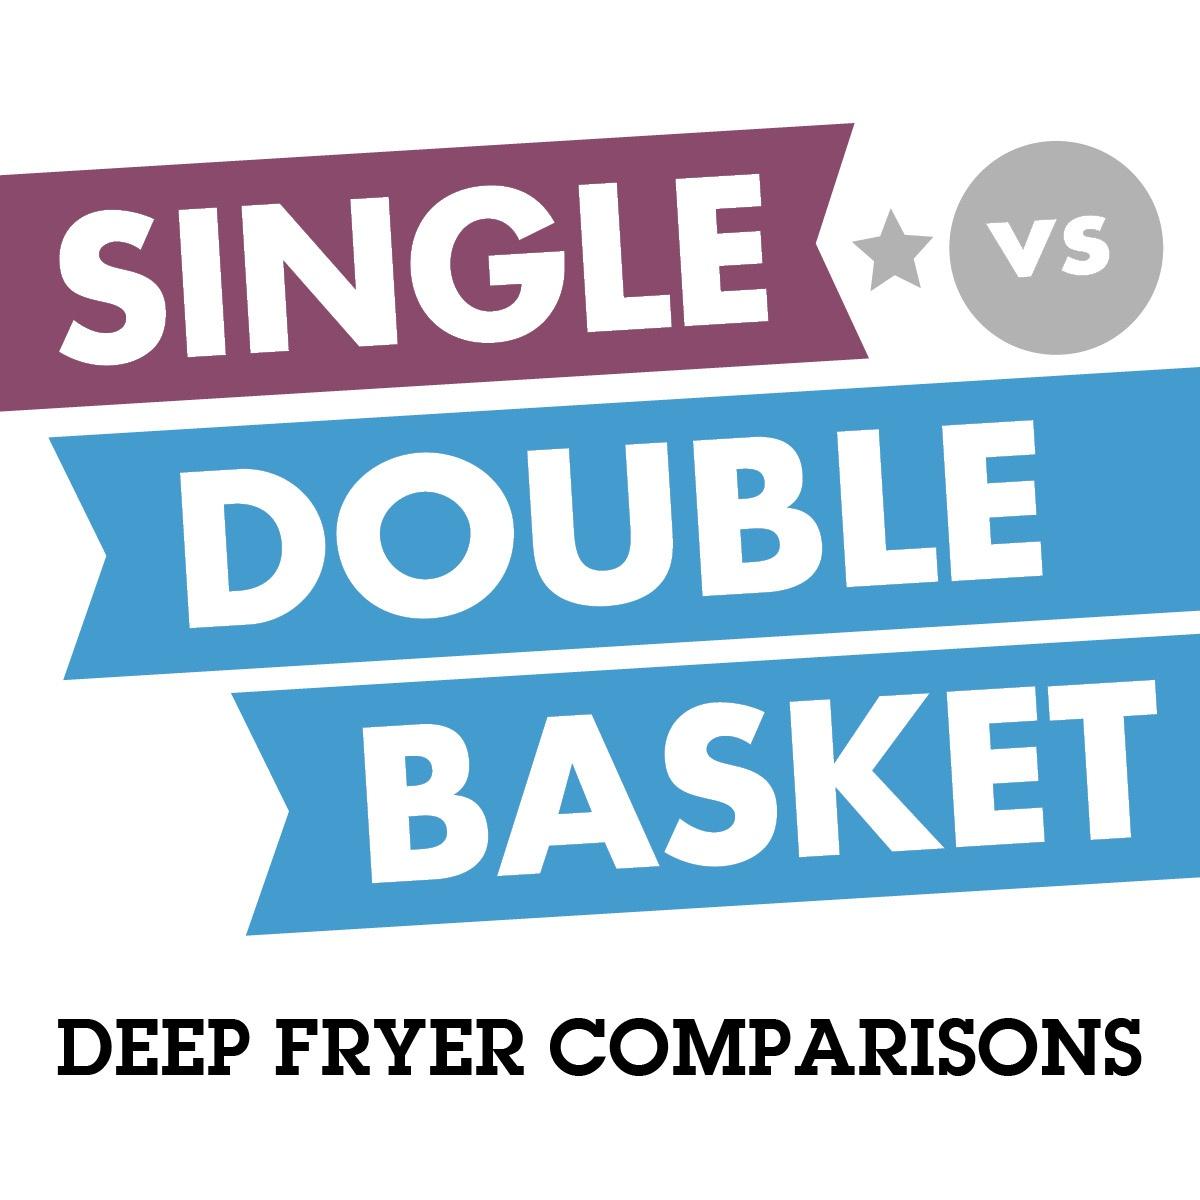 Single v sDouble Basket Deep Fryers